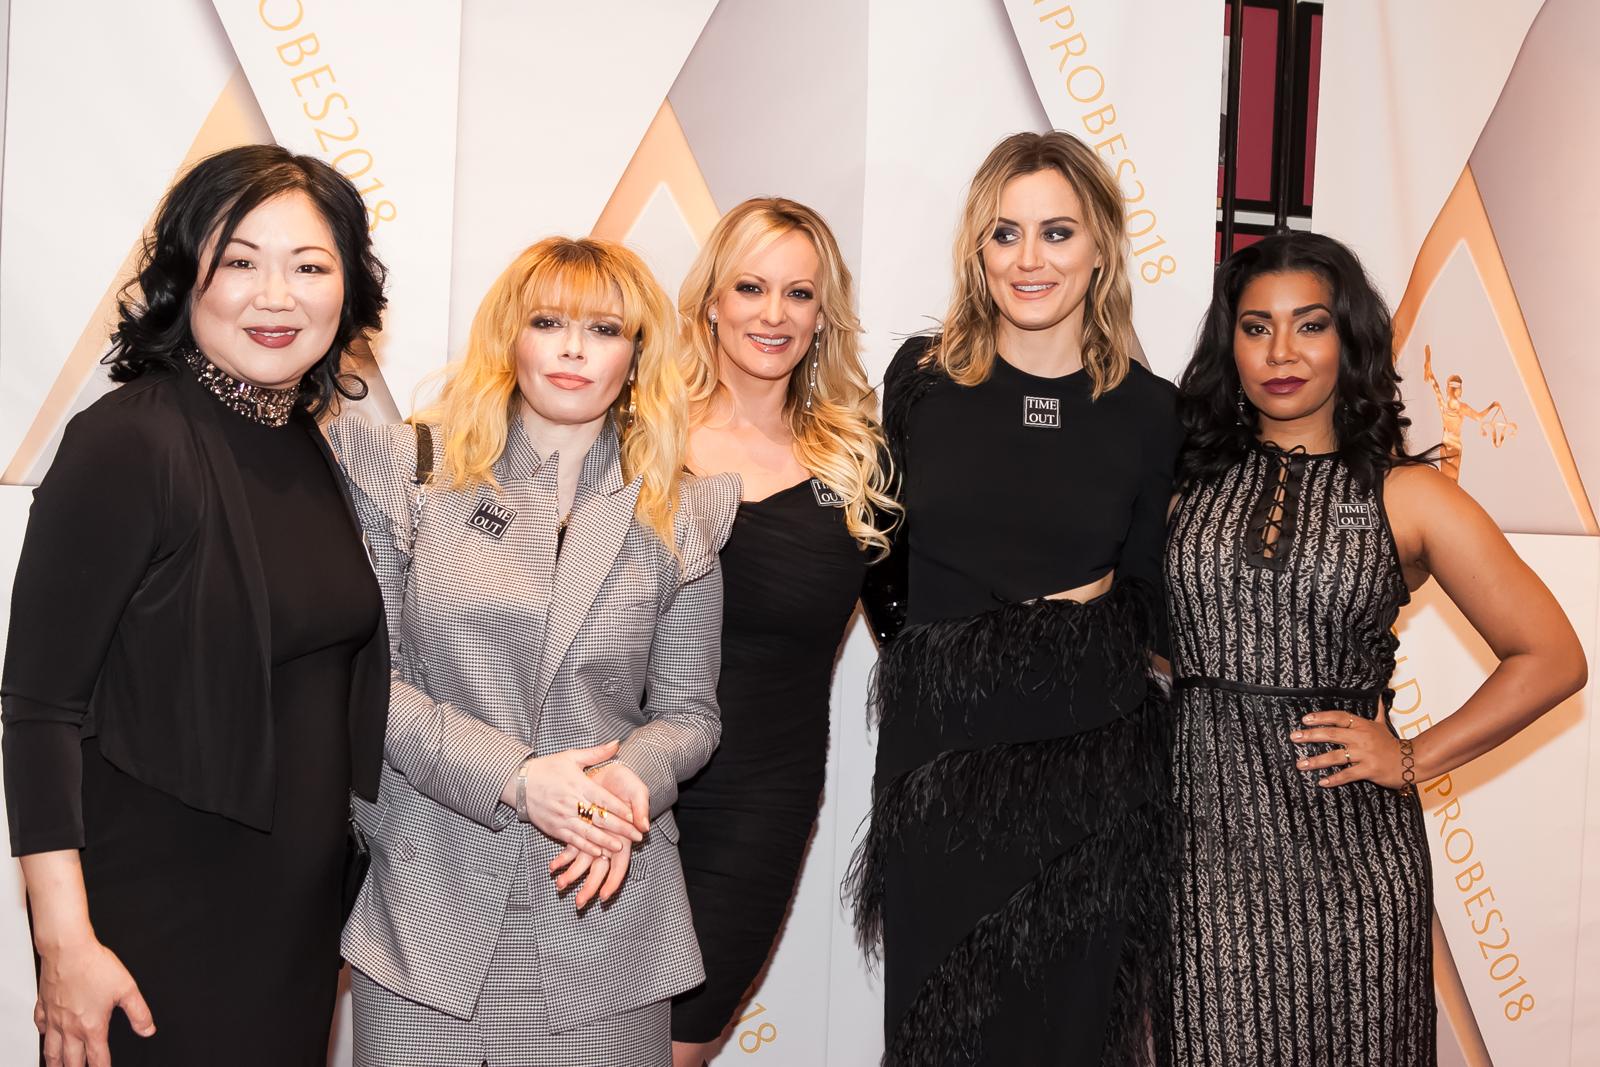 Margaret Cho, Natasha Lyonne, Stormy Daniels, Taylor Schilling, Jessica Pimentel